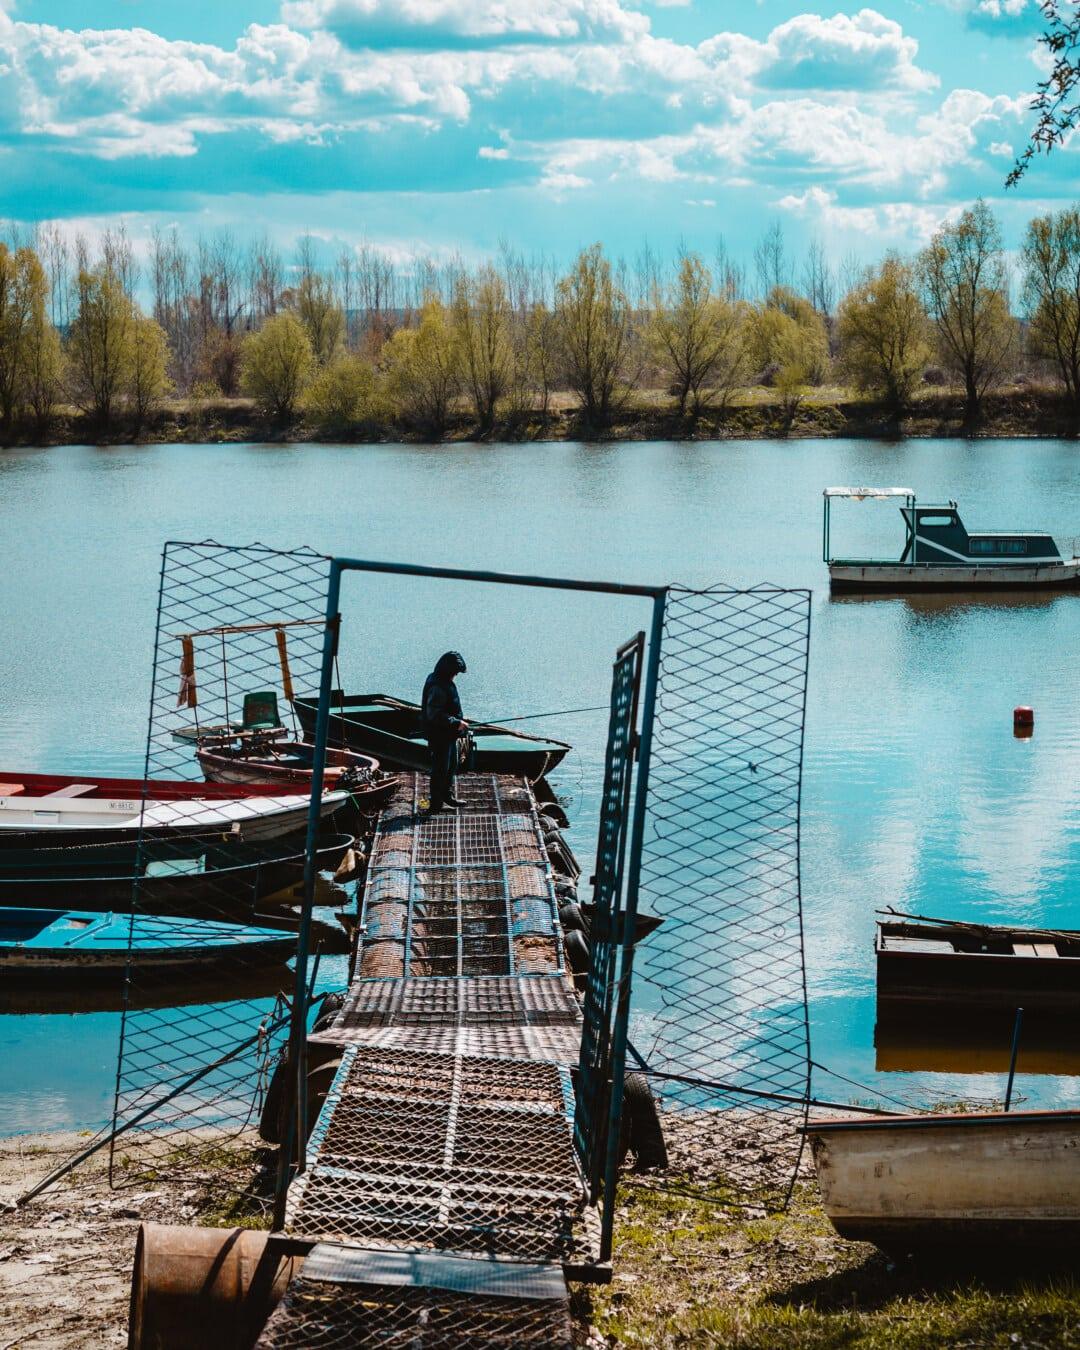 fishing rod, fishing, fisherman, fishing boat, harbour, dock, water, boat, watercraft, lake